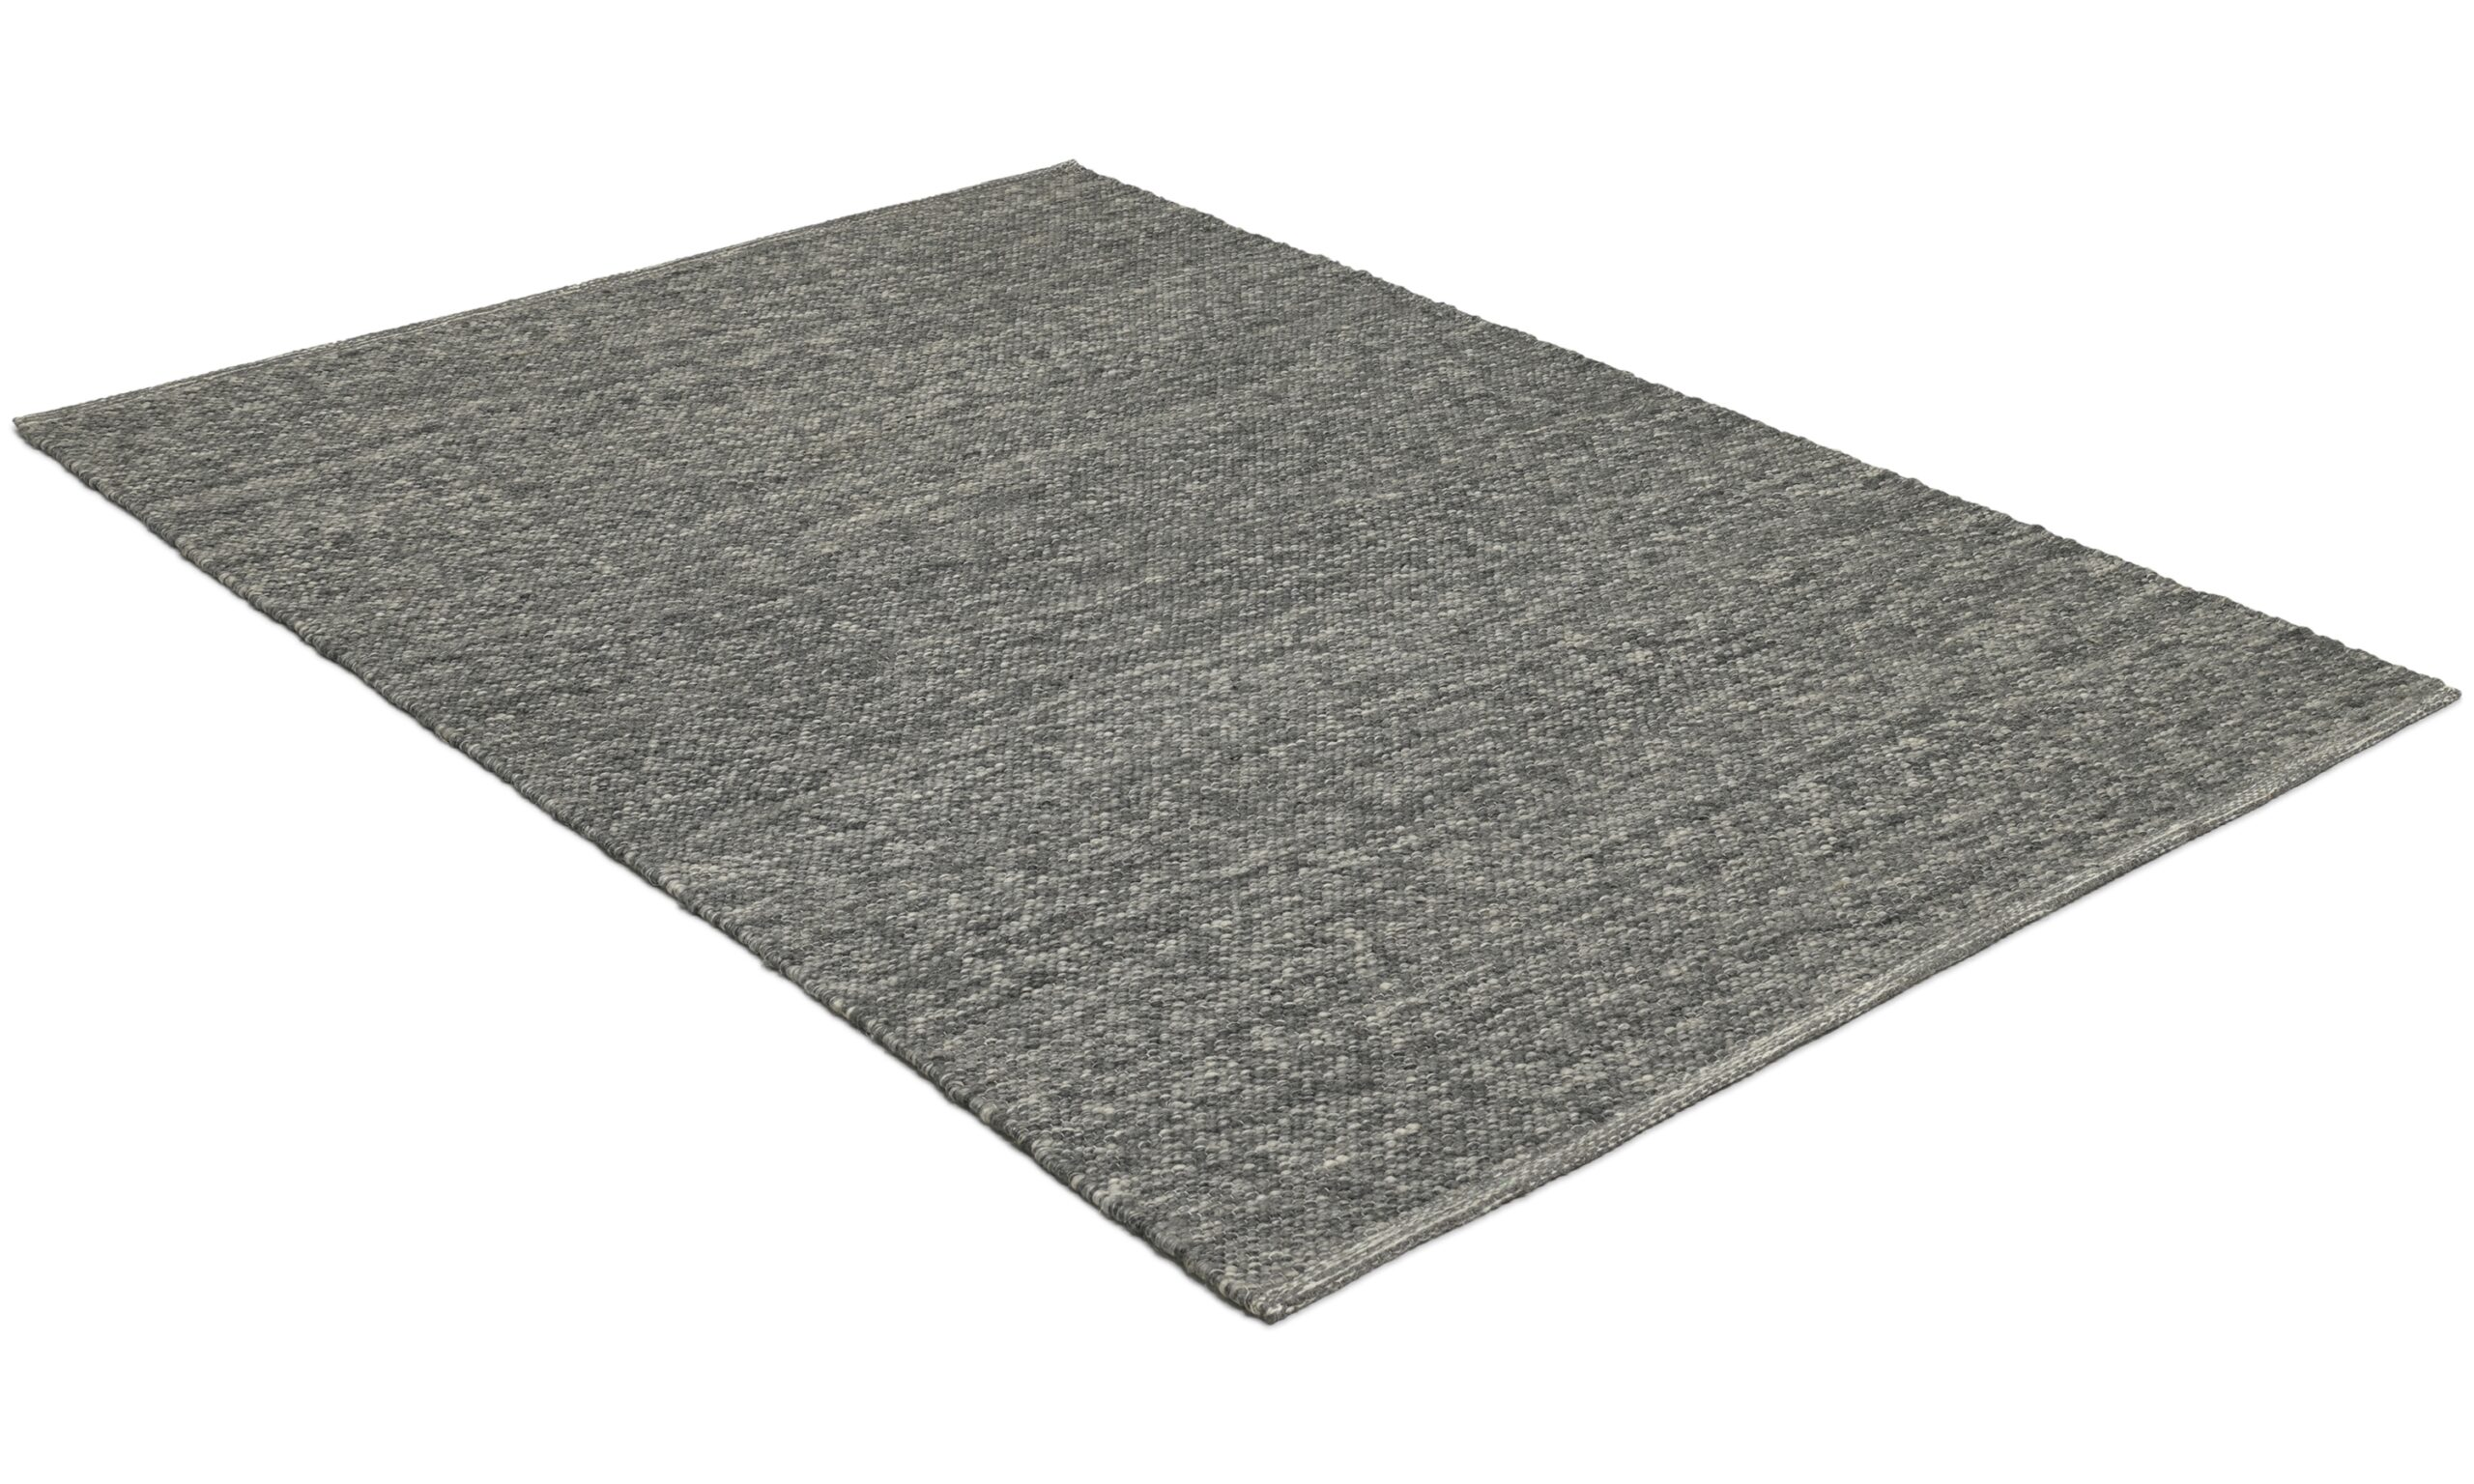 Kalix mørk grå - håndvevd ullteppe